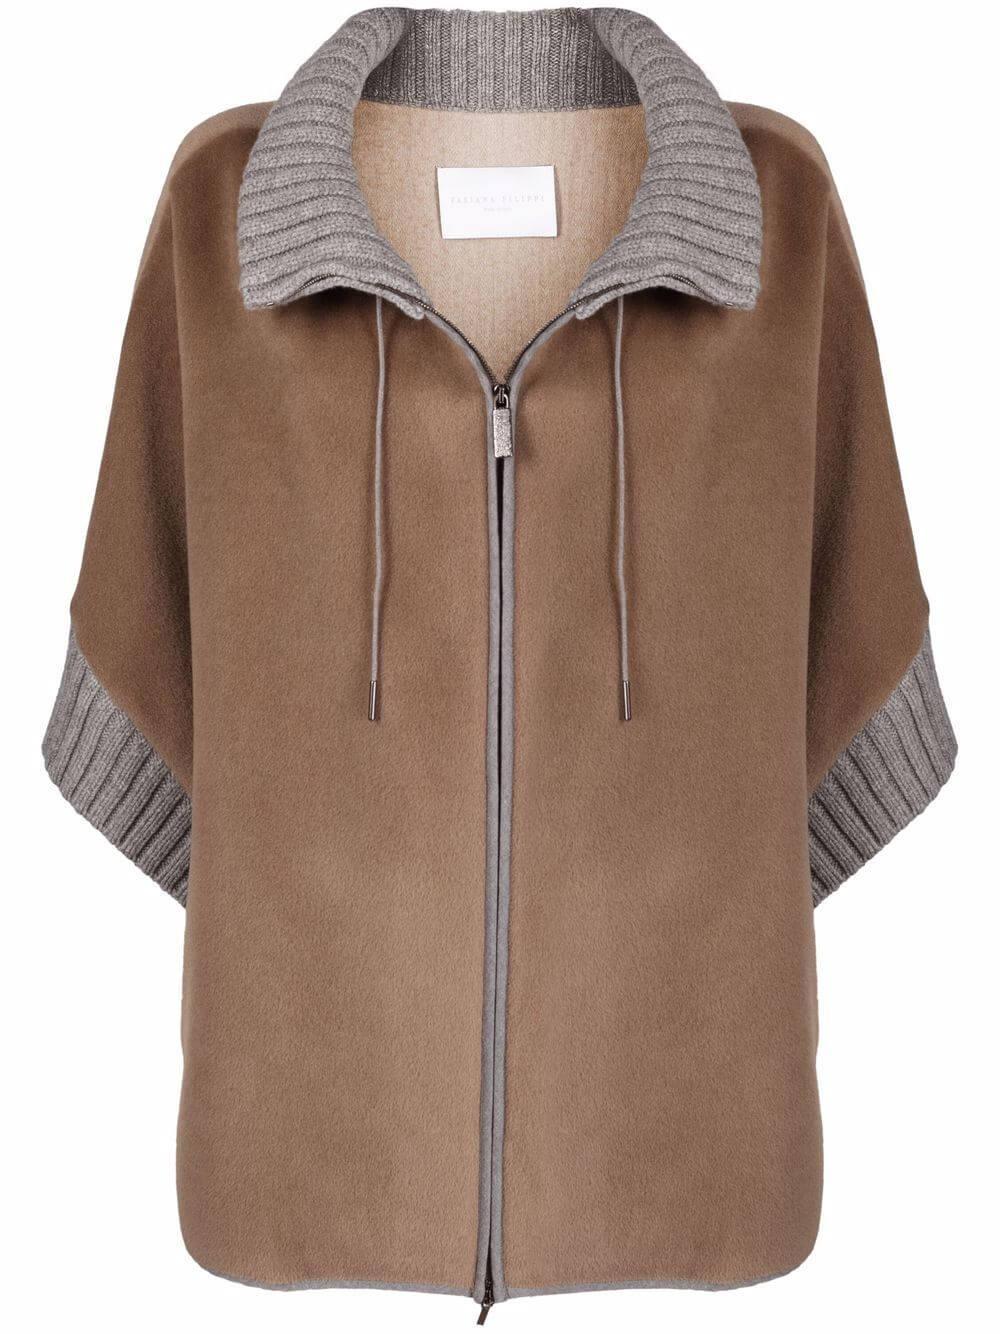 Zip- Up Sweater Poncho Item # CTD221W235